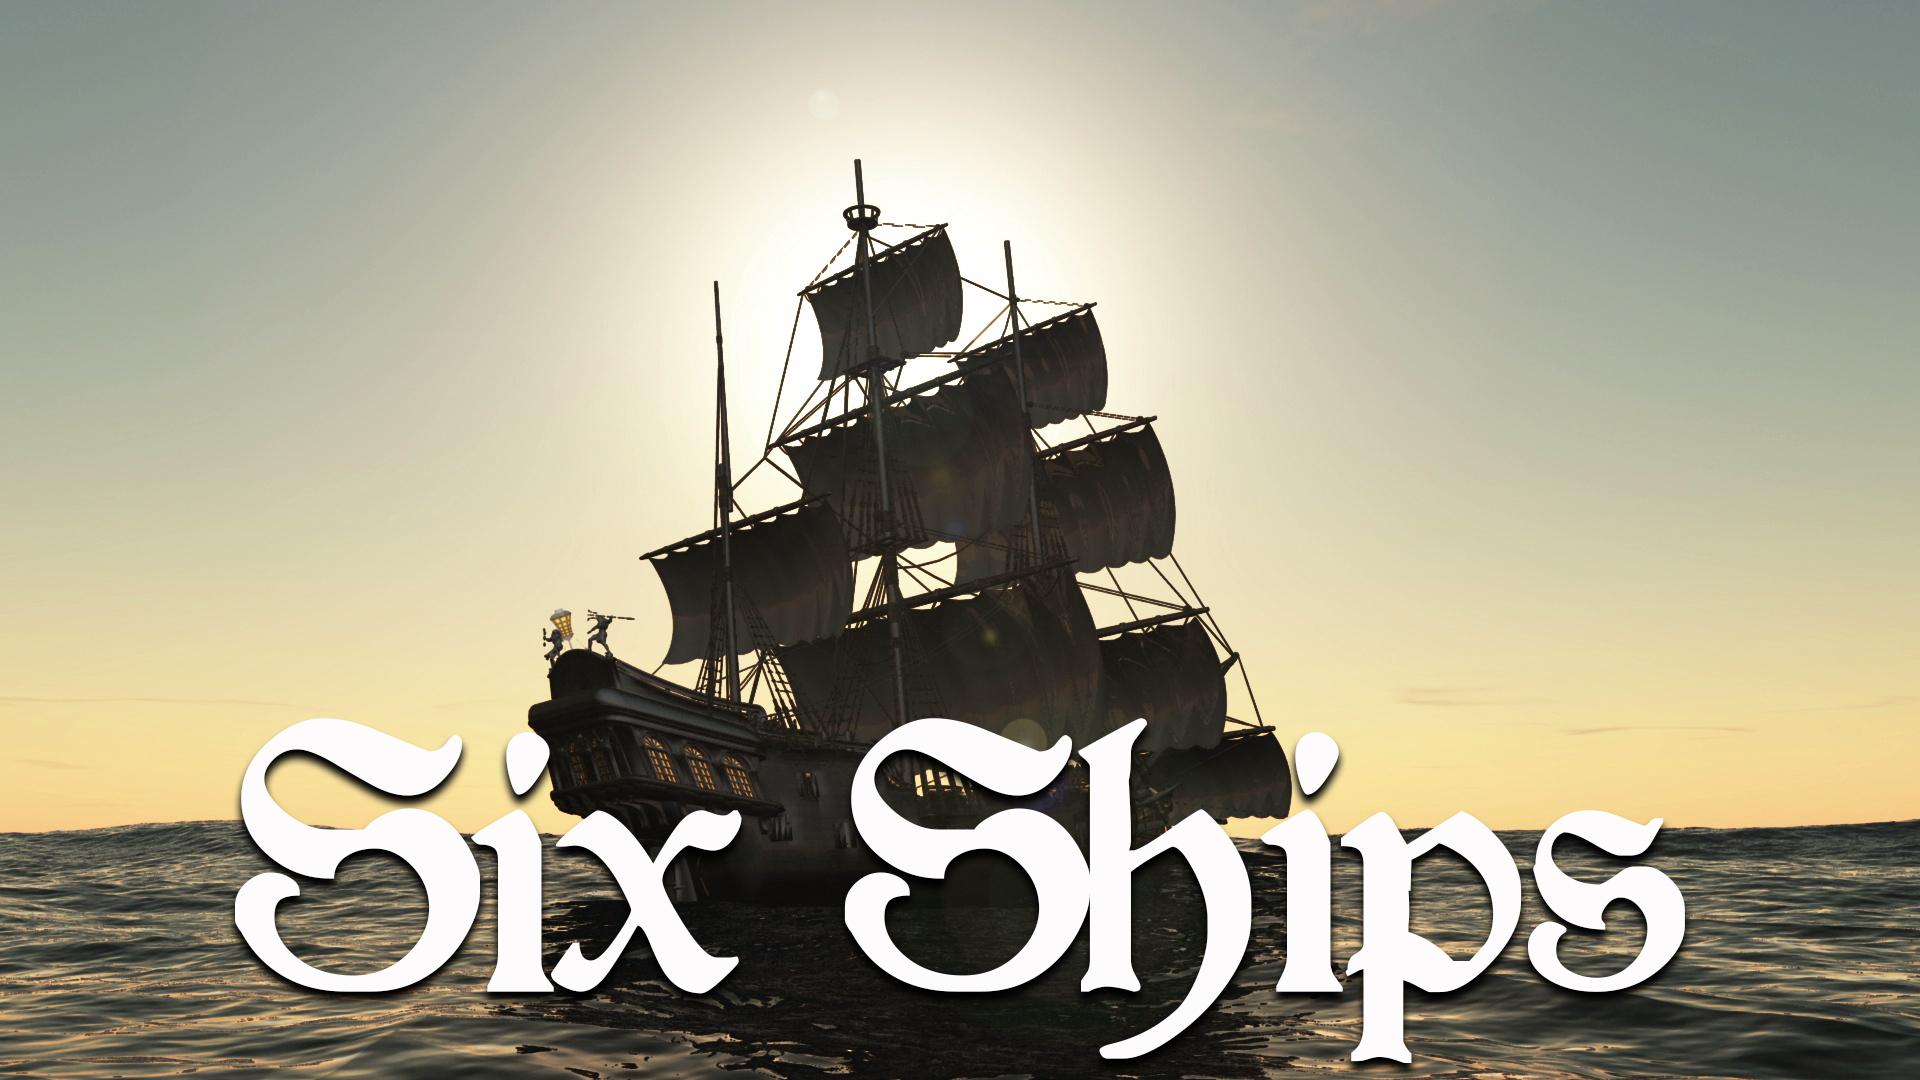 Six ships title